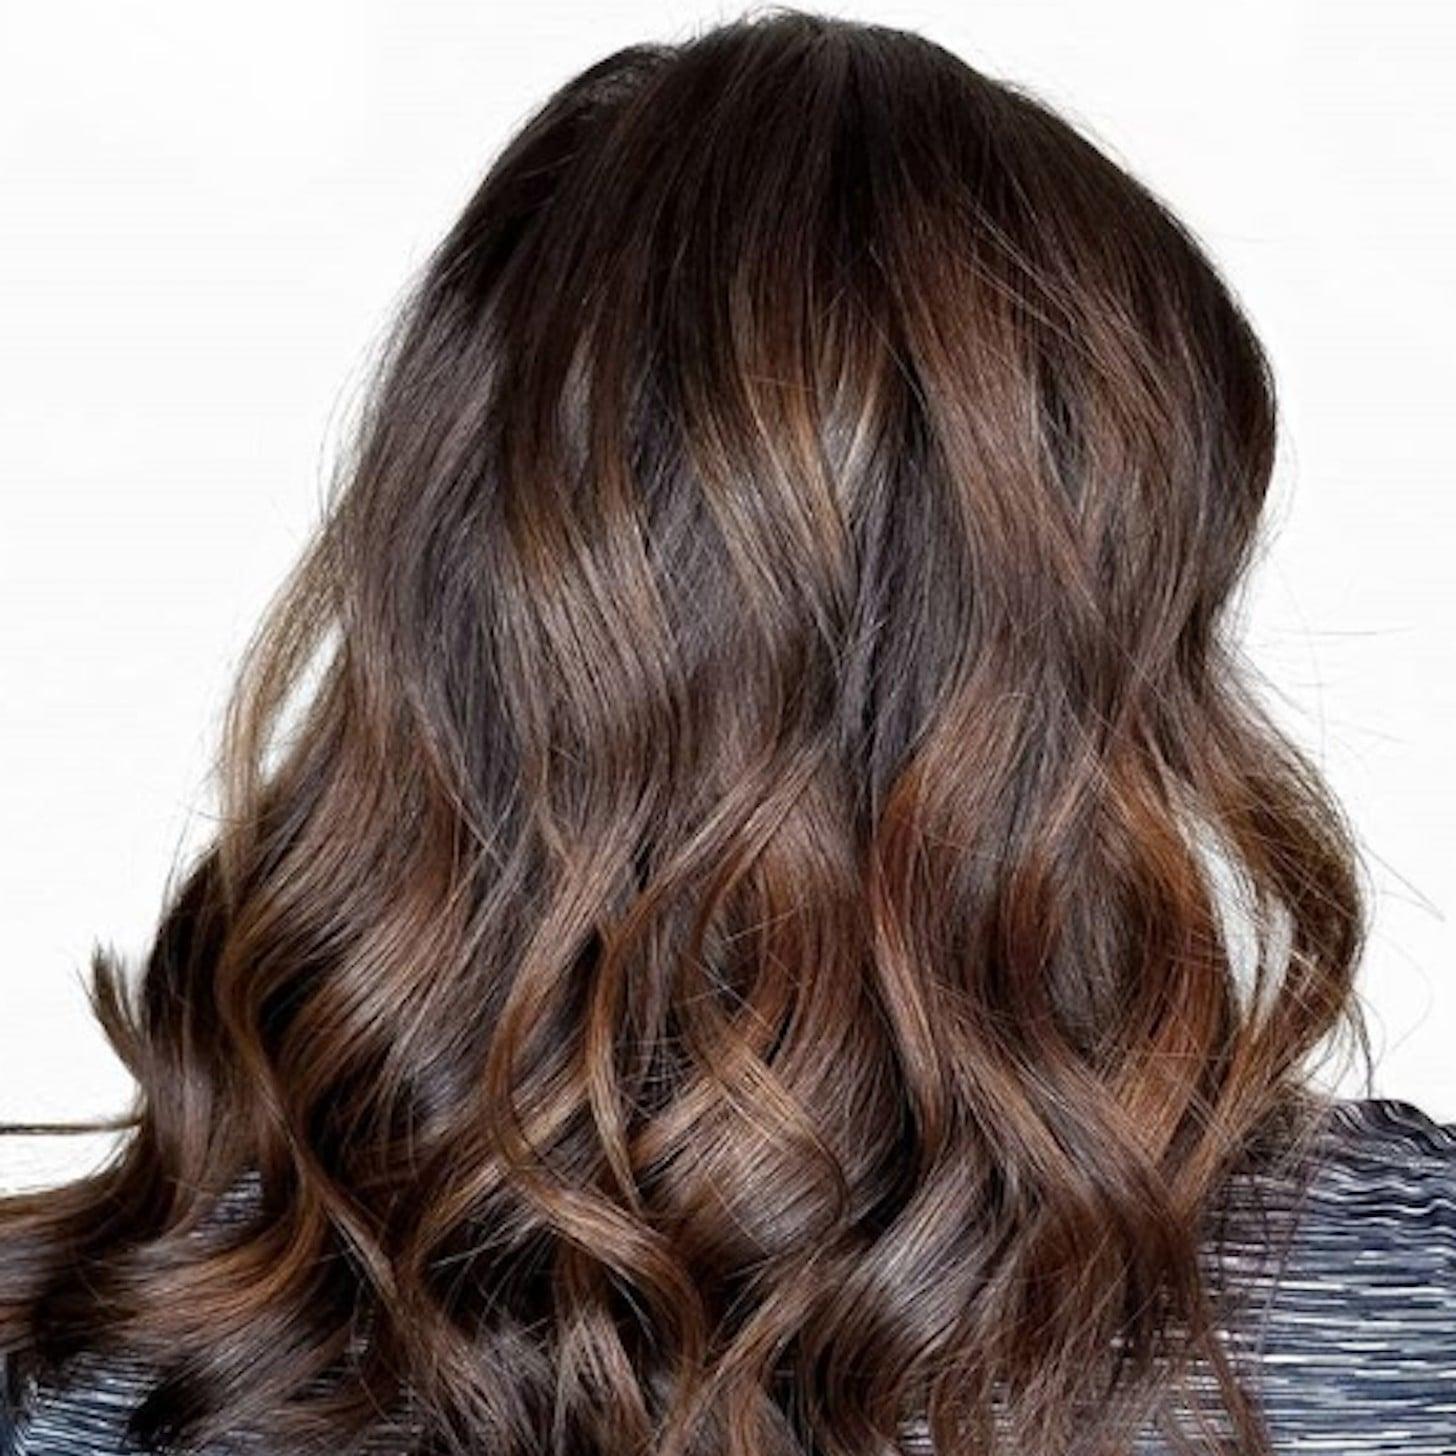 Dark Chocolate Fall Brunette Hair Colours 2018 Popsugar Beauty Australia Photo 8